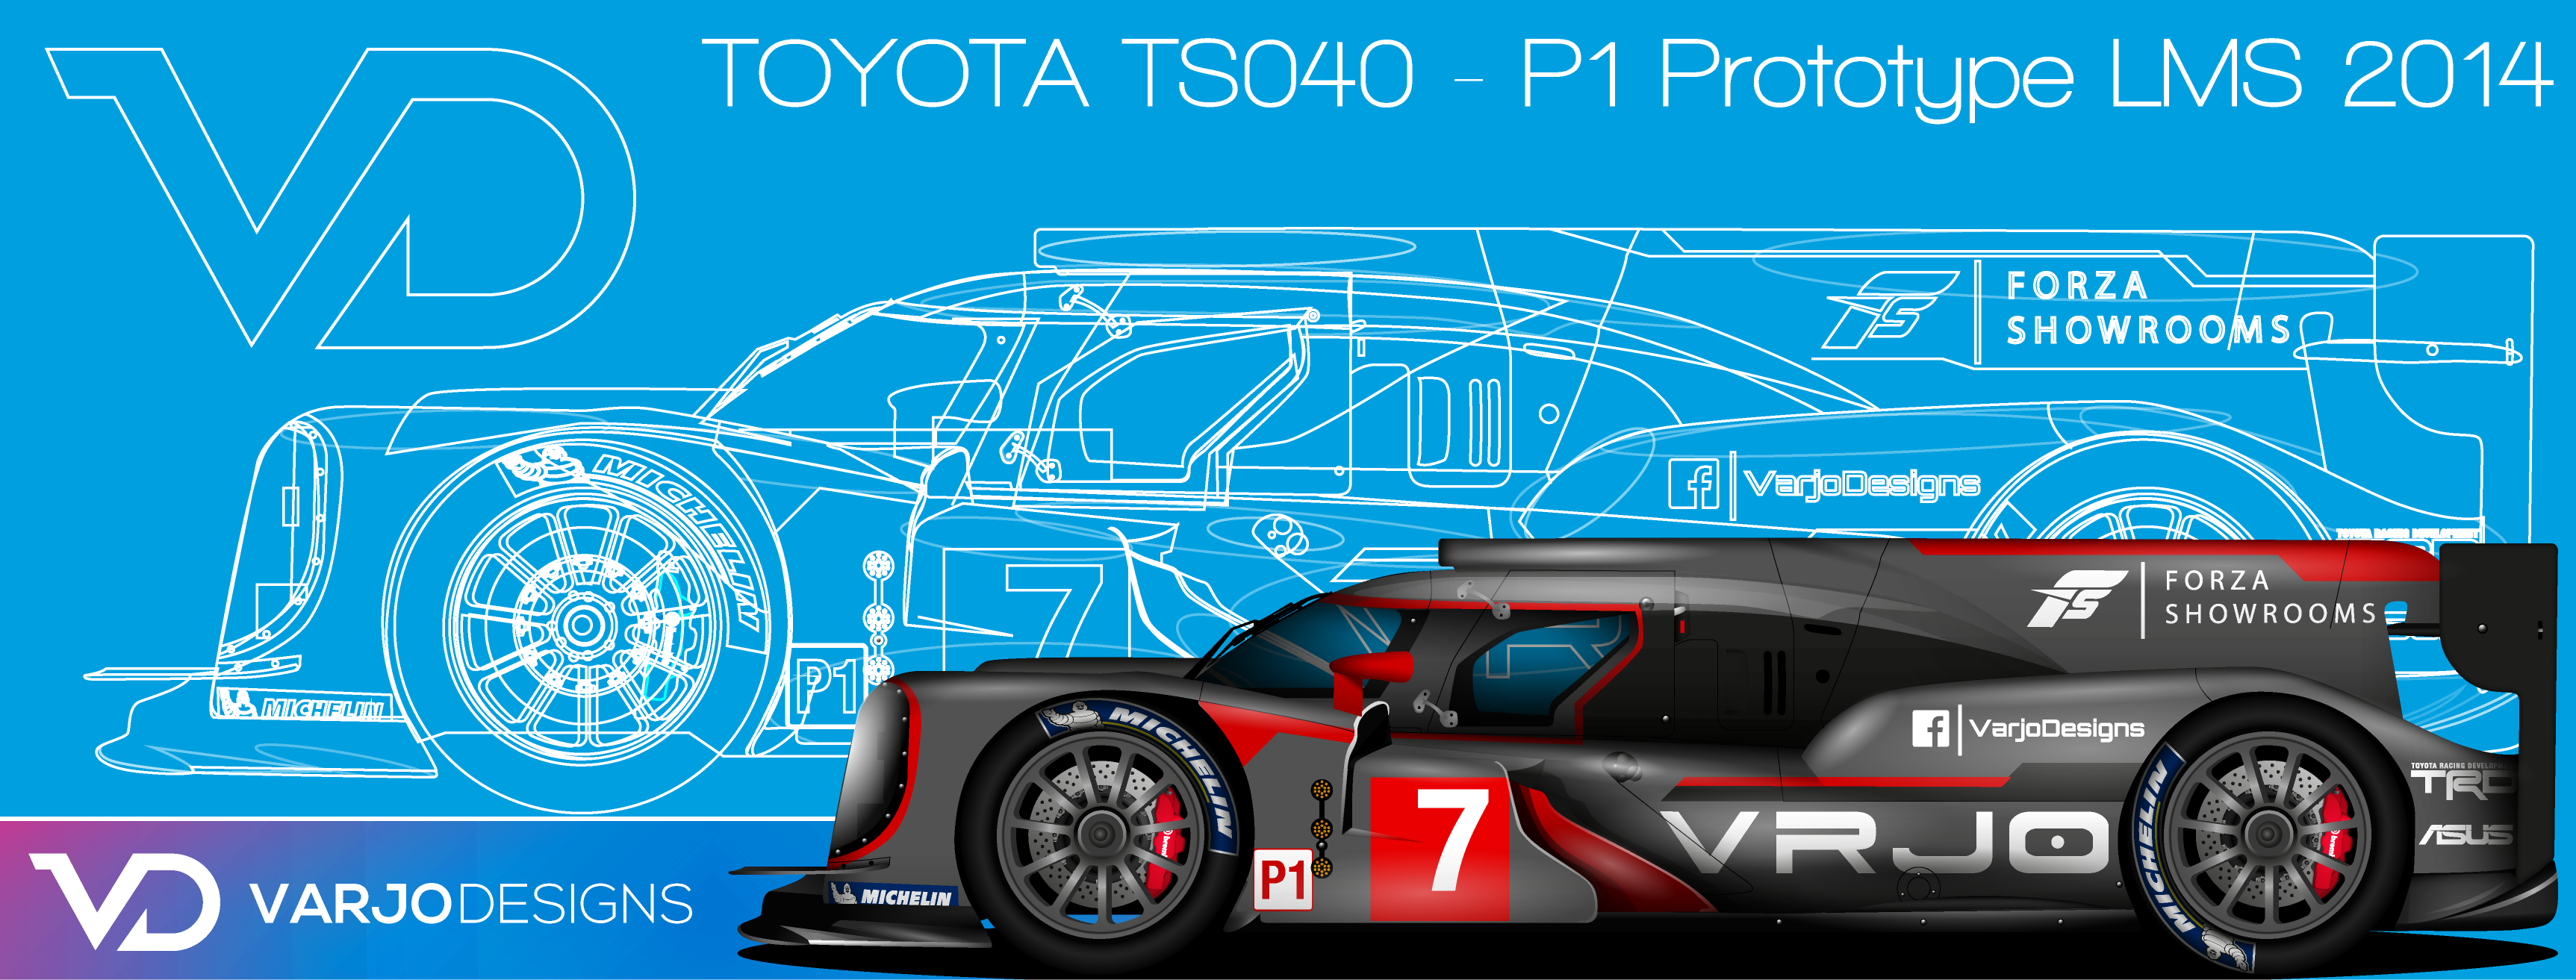 Ts040 blueprint graphic and new logo ts040 blueprint graphic and new logo car art malvernweather Choice Image